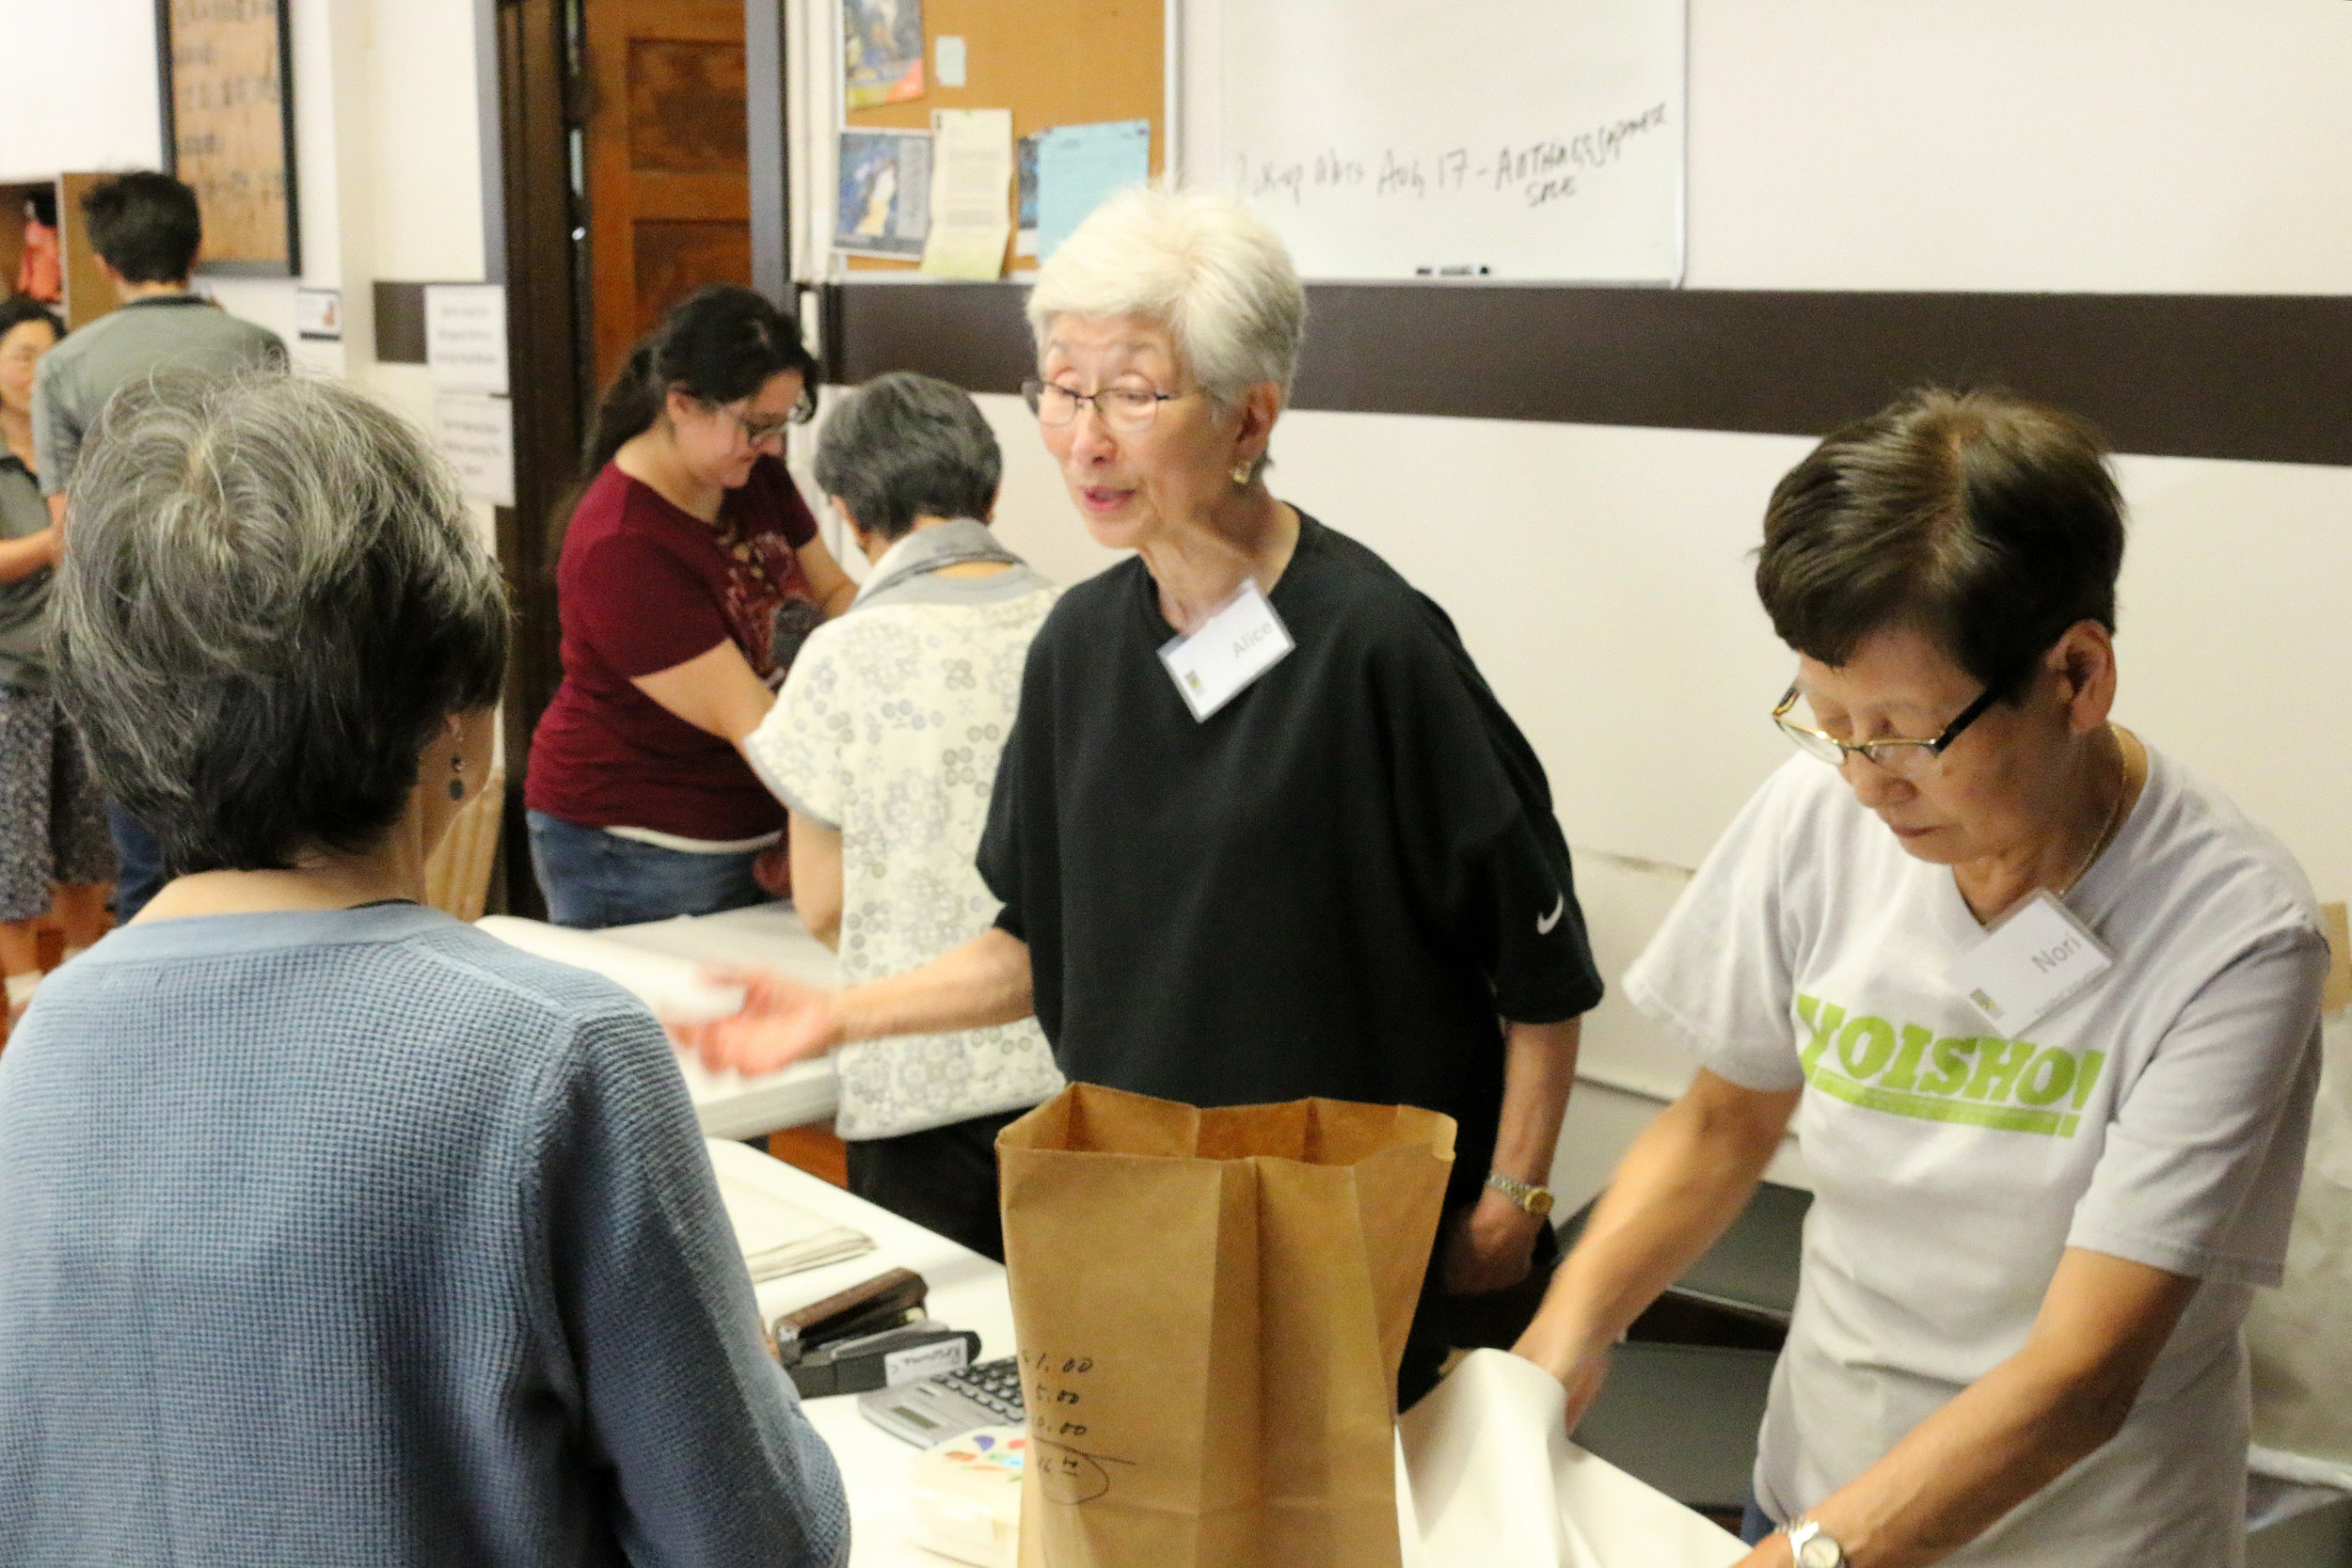 jcccw-yoshio-volunteer-table-staff.JPG